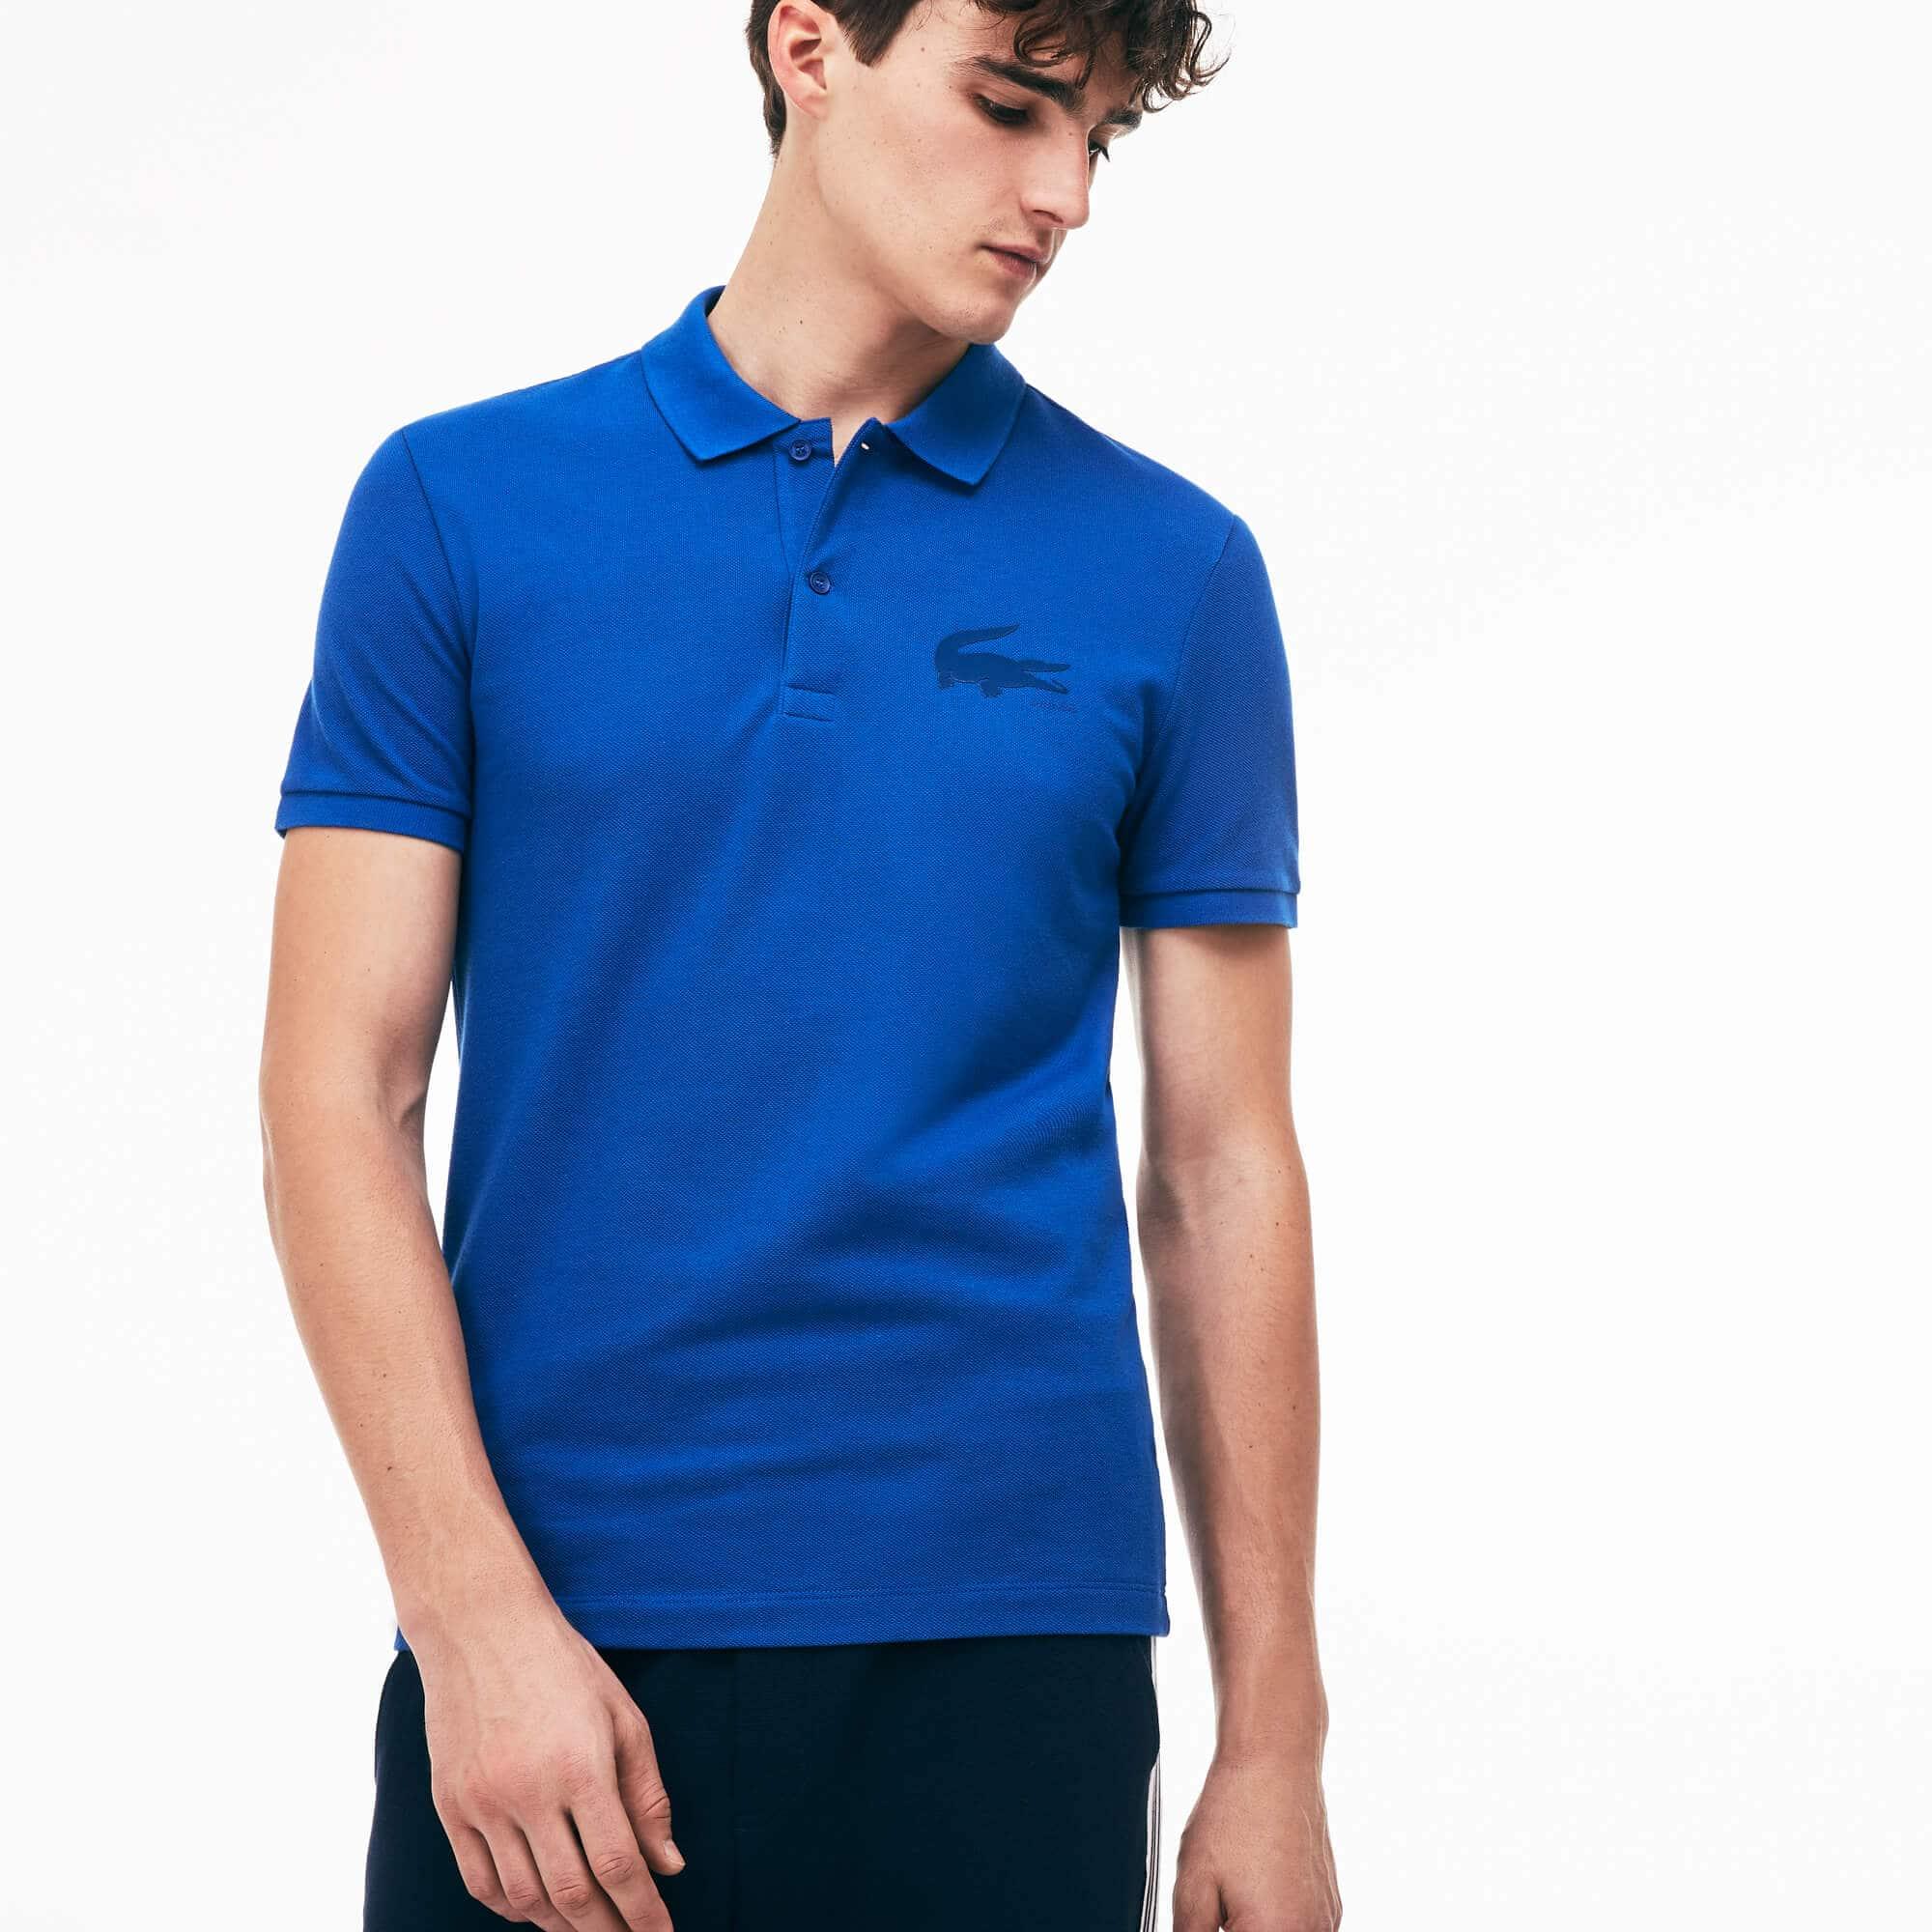 Men's Slim Fit Crocodile Logo Piqué Polo